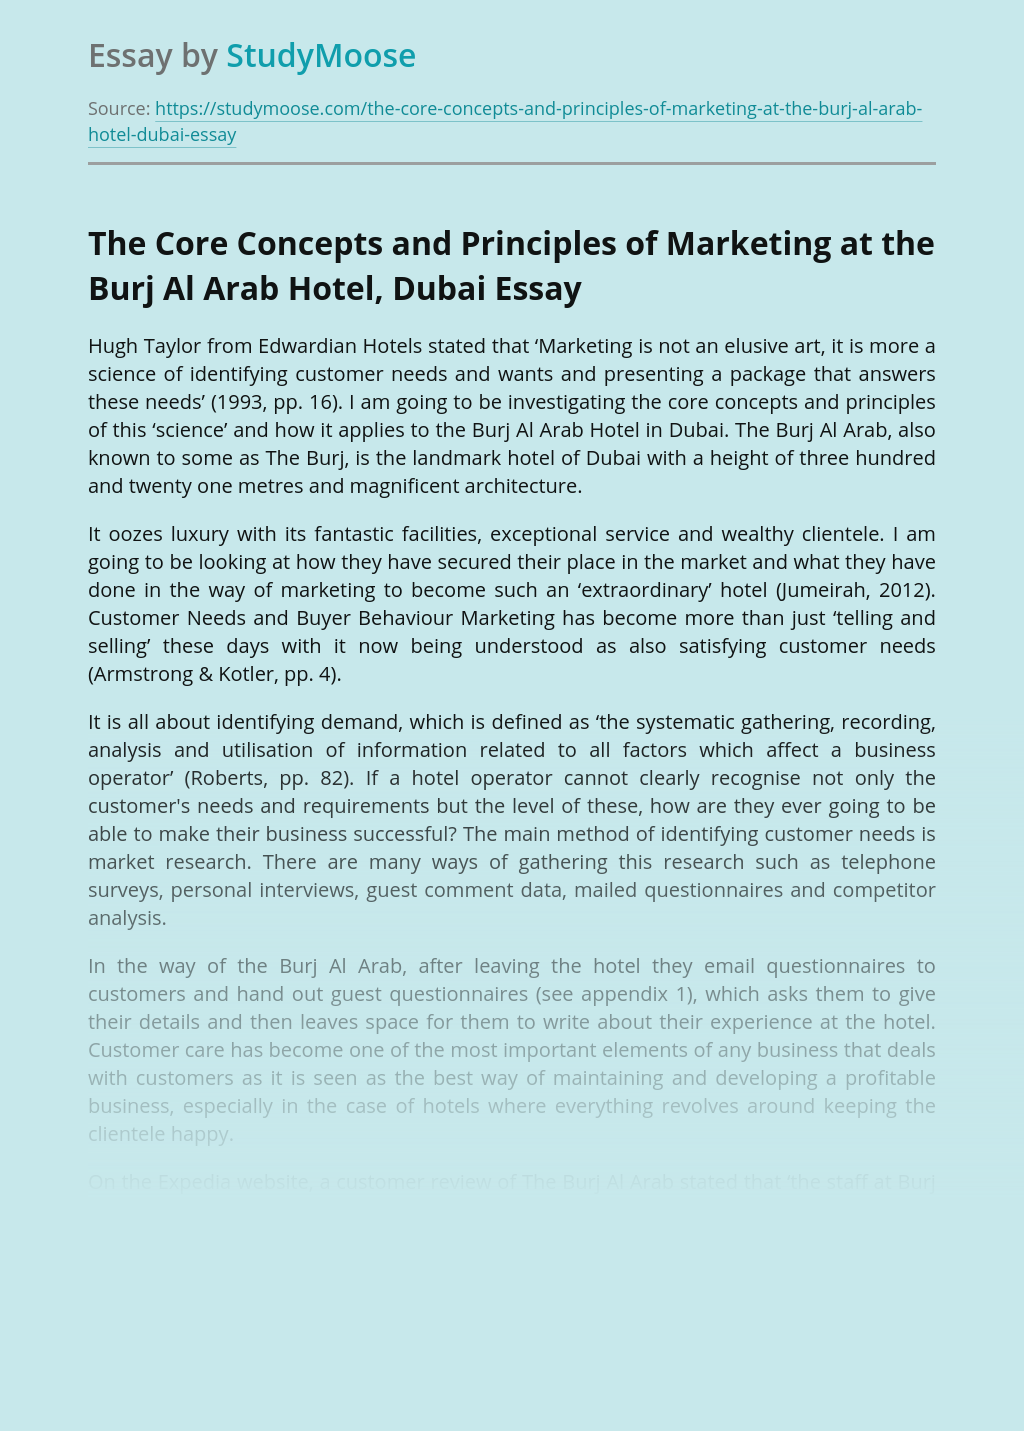 The Core Concepts and Principles of Marketing at the Burj Al Arab Hotel, Dubai